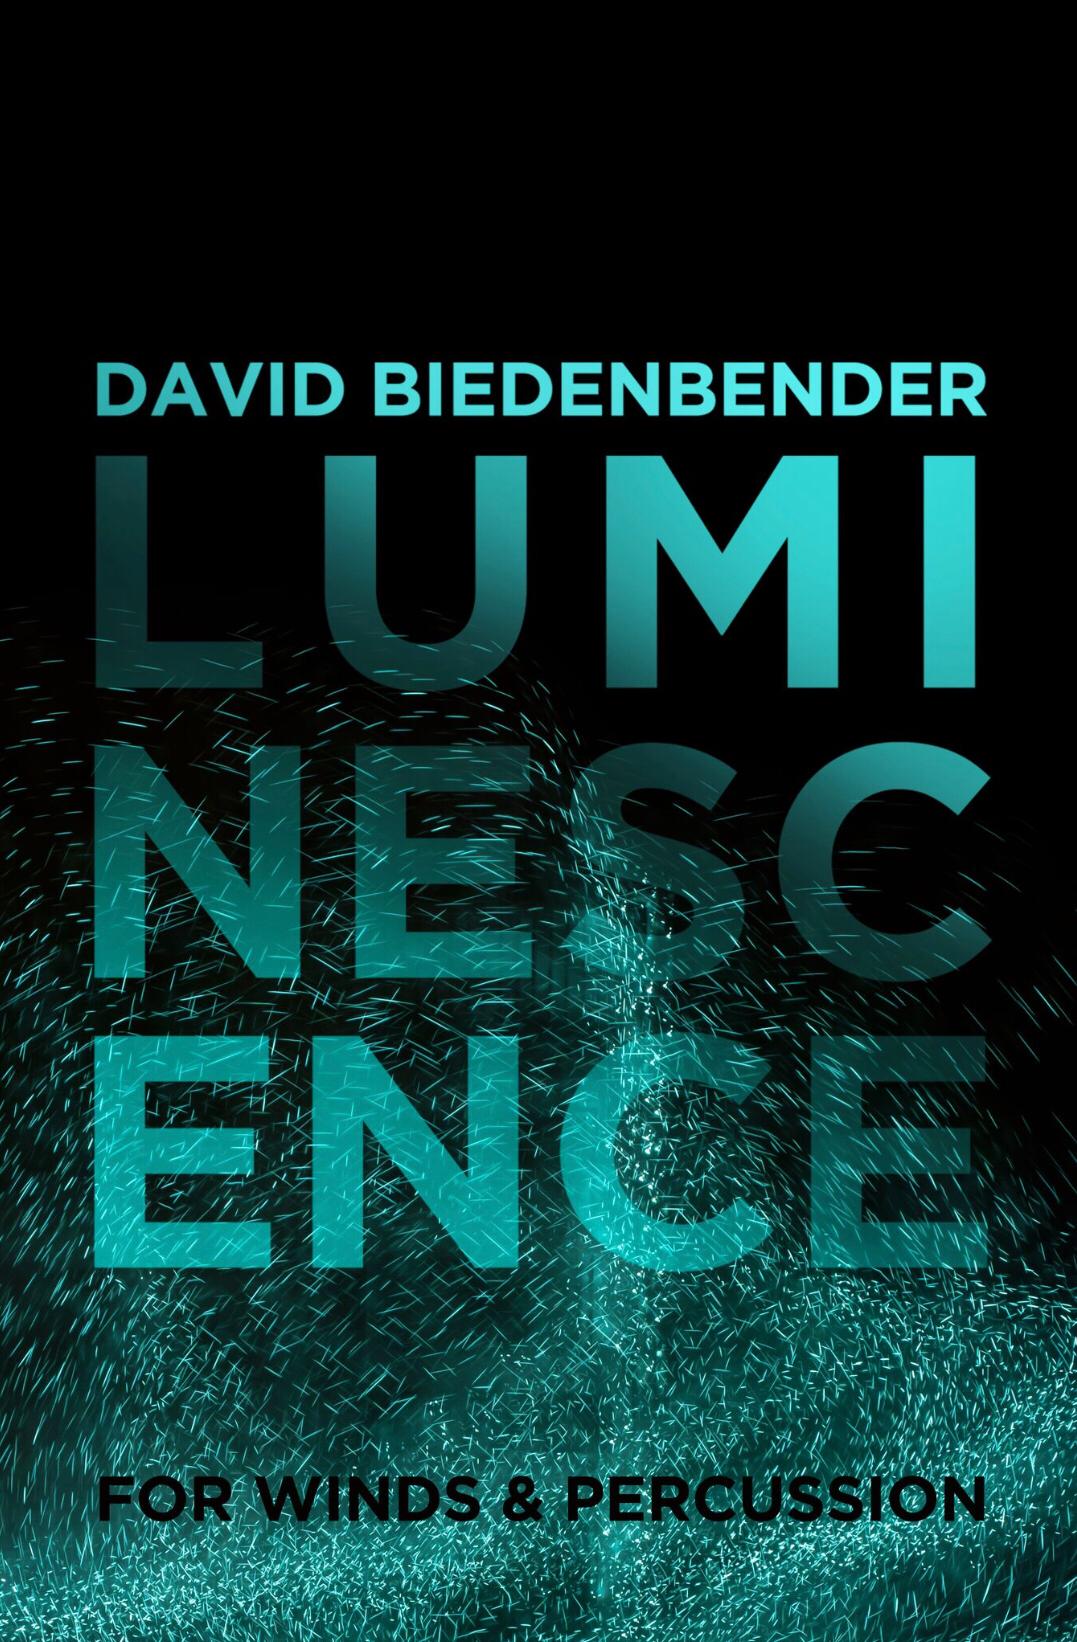 Luminescence by David Biedenbender